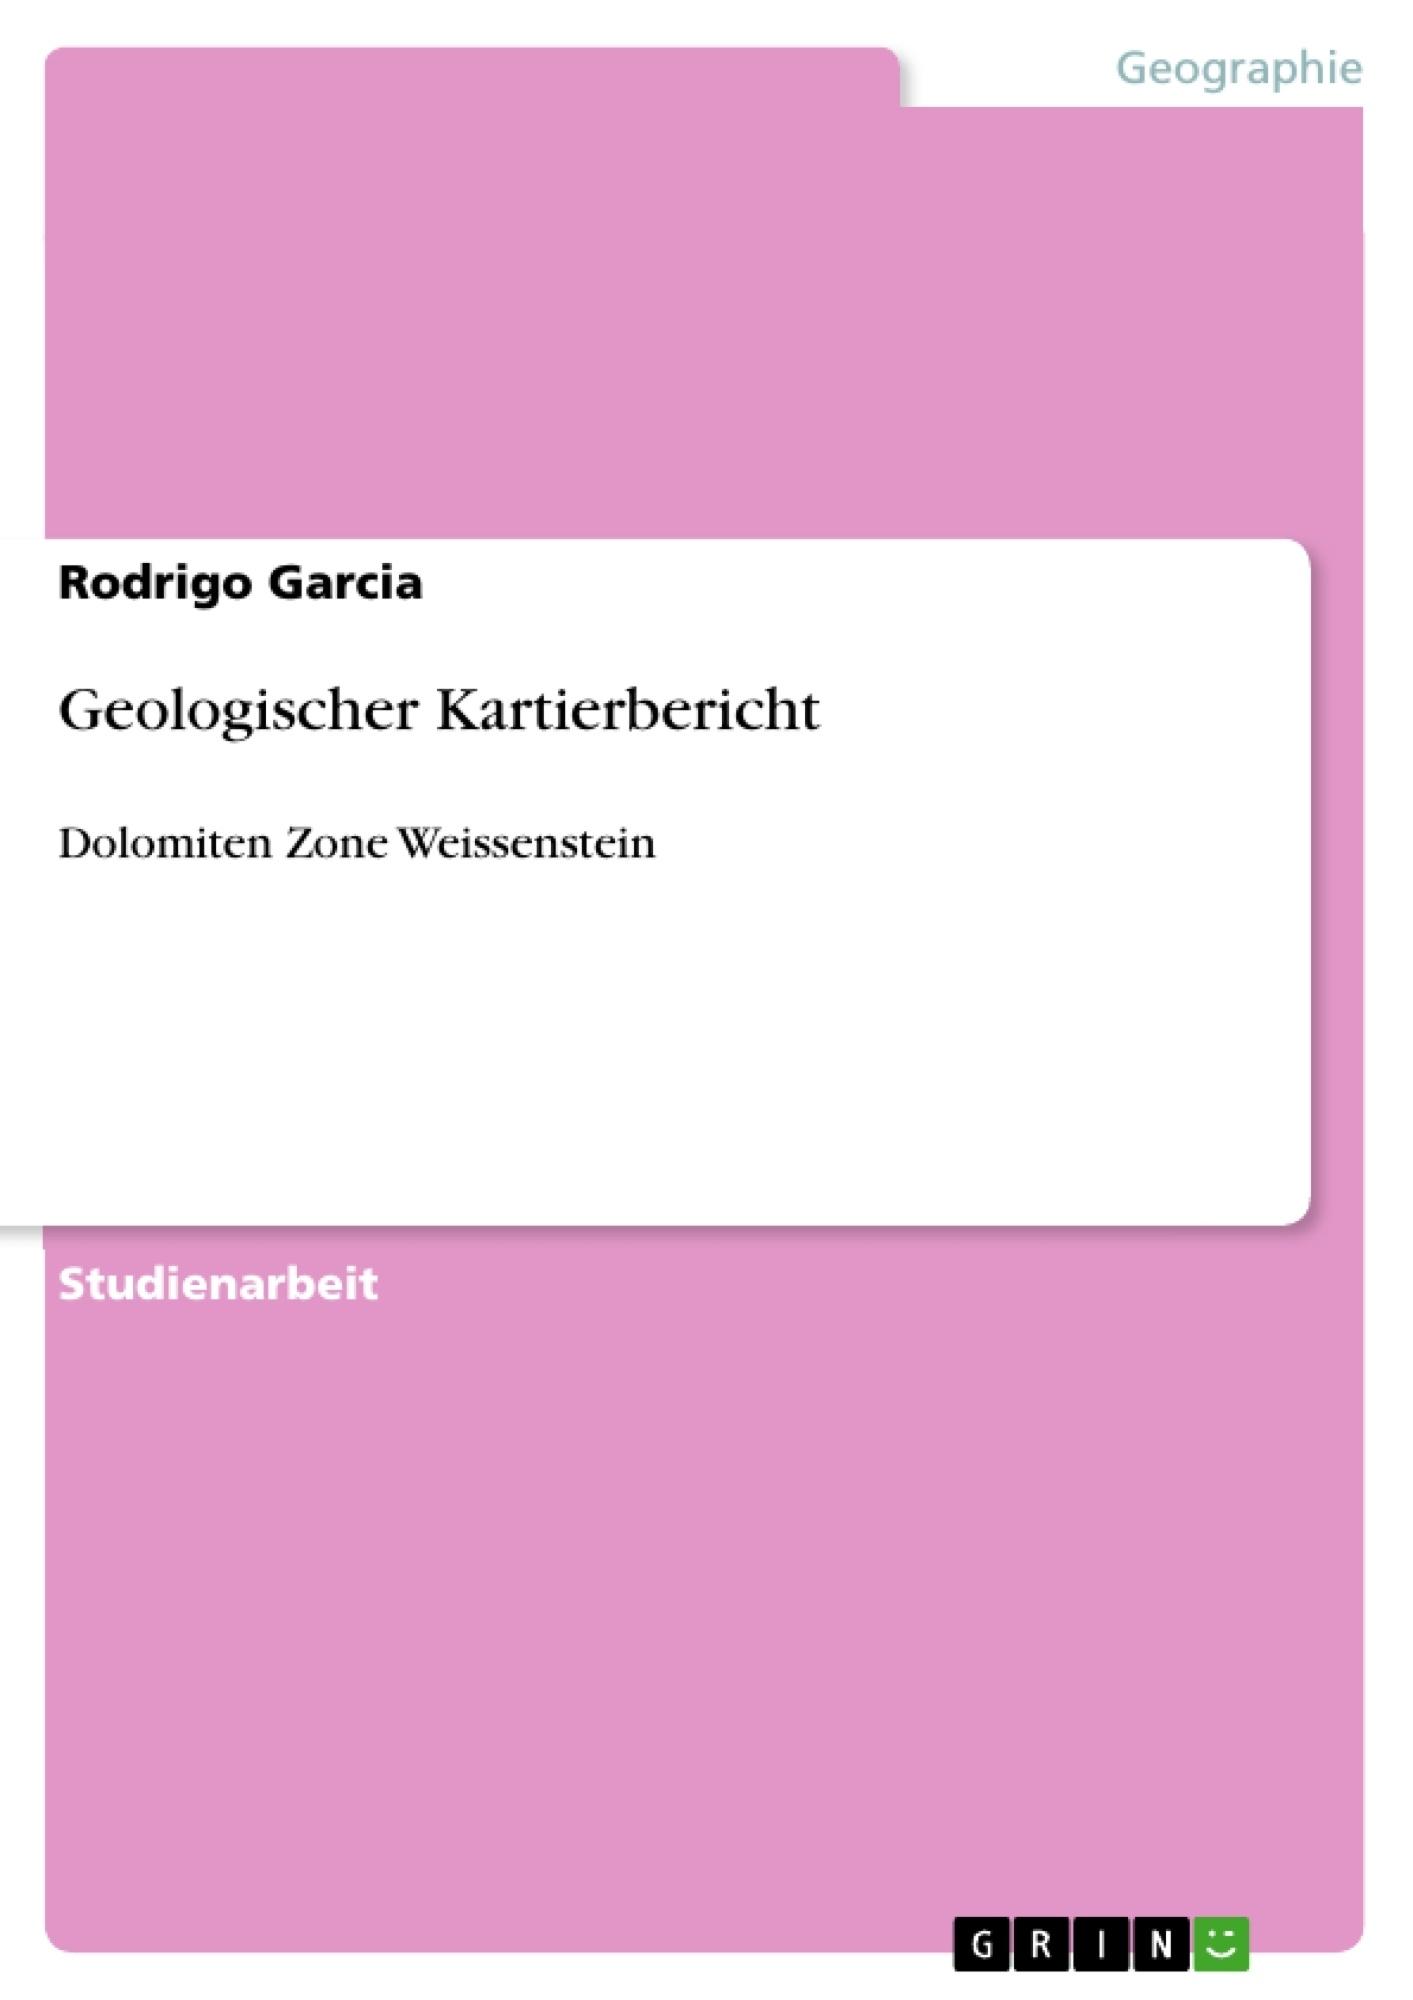 Titel: Geologischer Kartierbericht